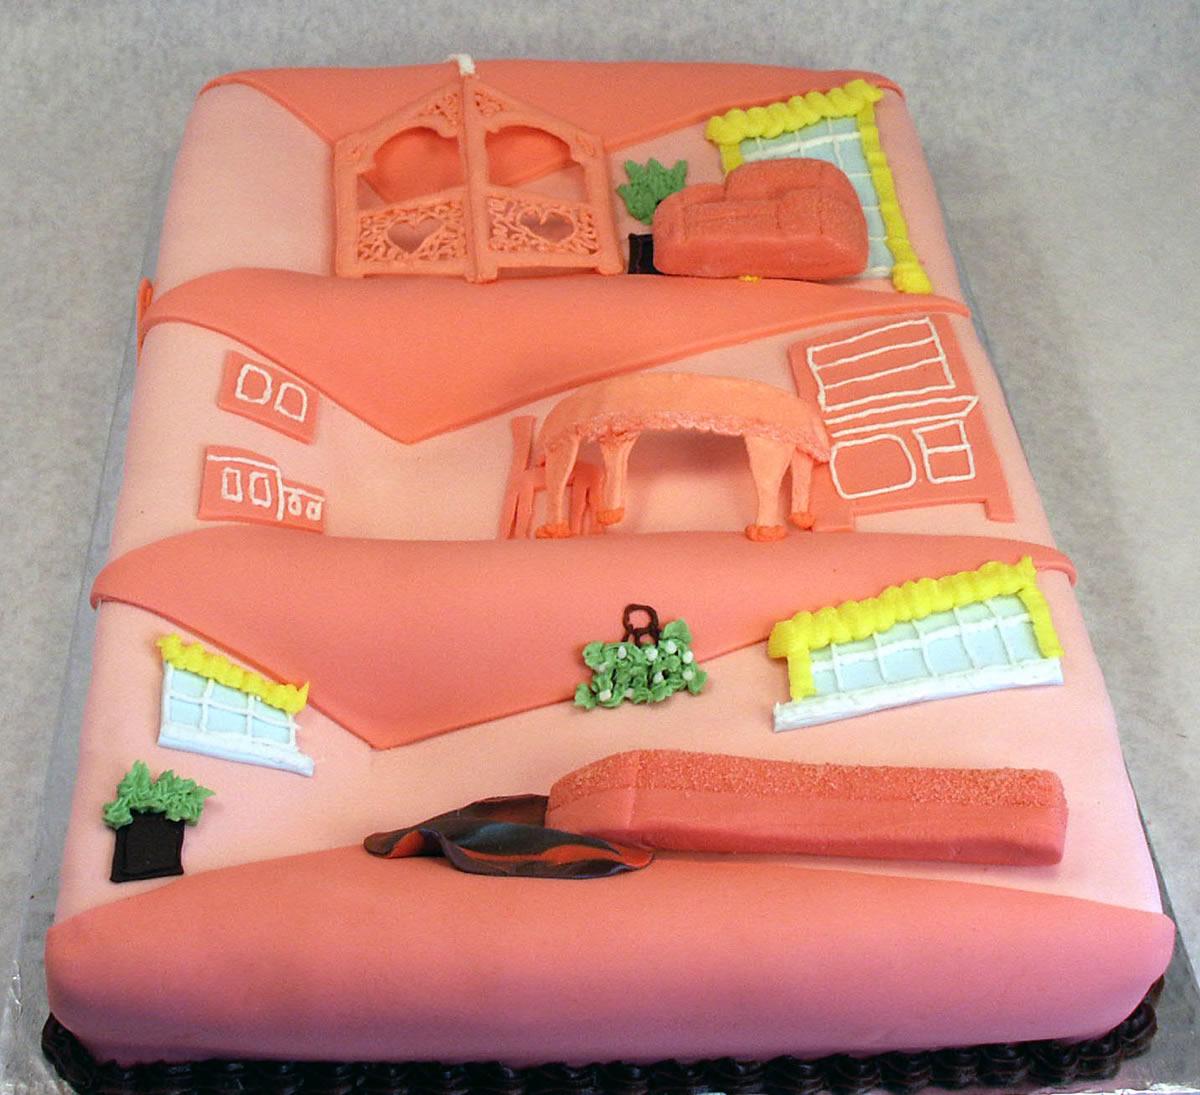 Barbie Dream House Cake Texas Rose Bakery